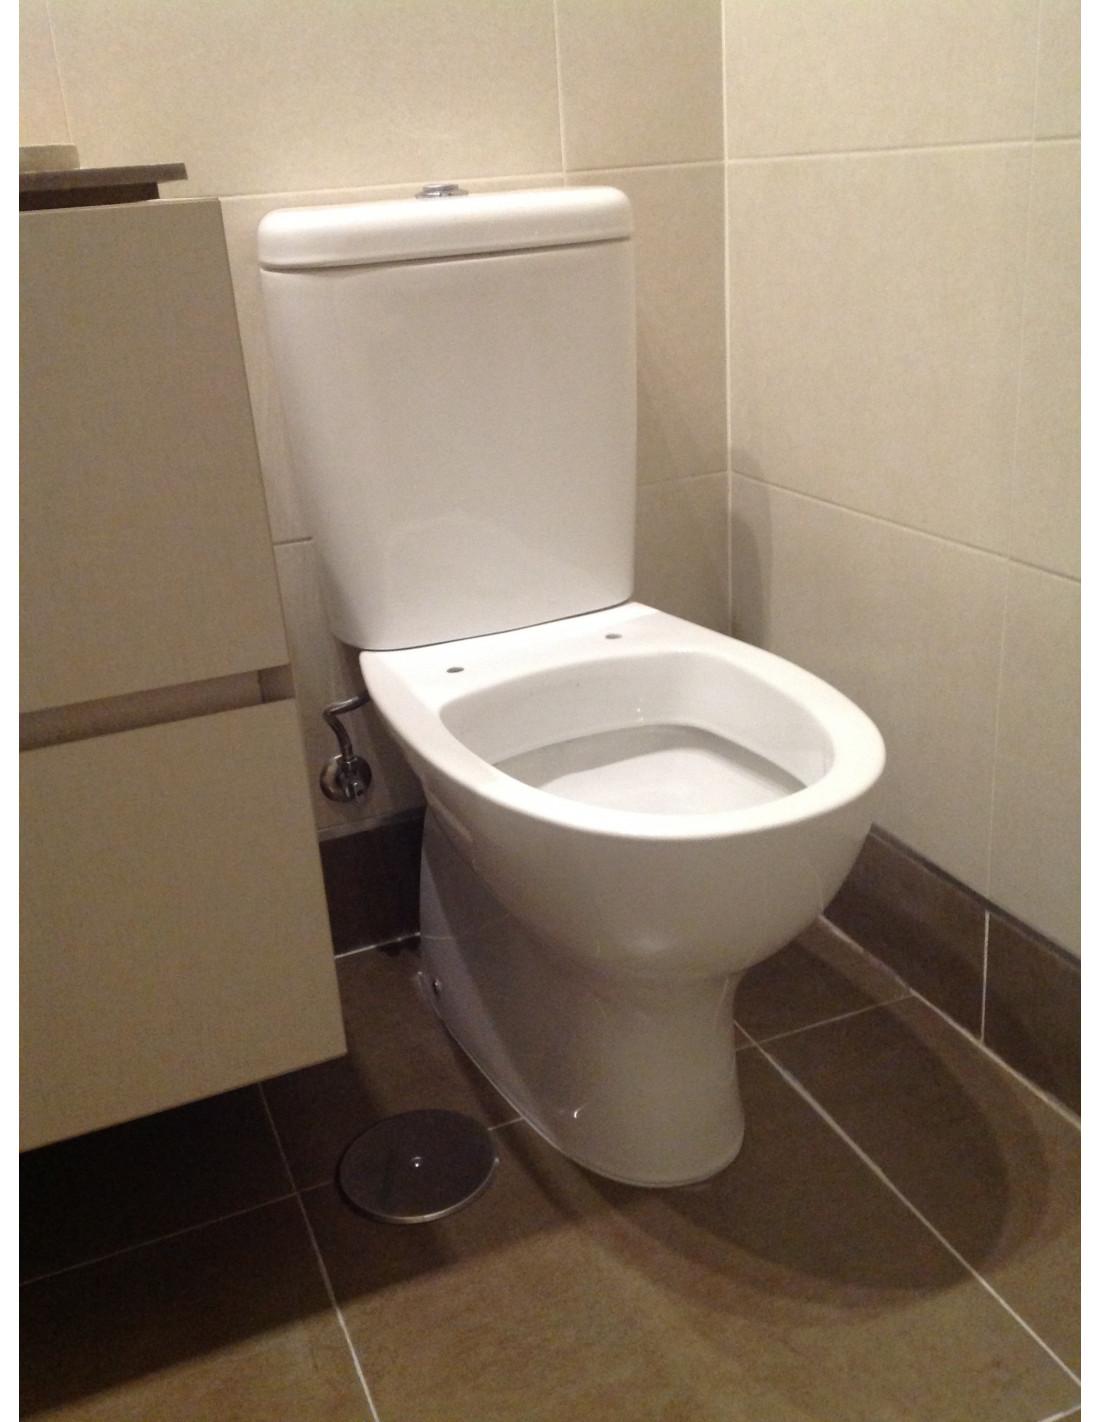 Tapa wc gala loa adaptable en resiwood for Tapa water gala